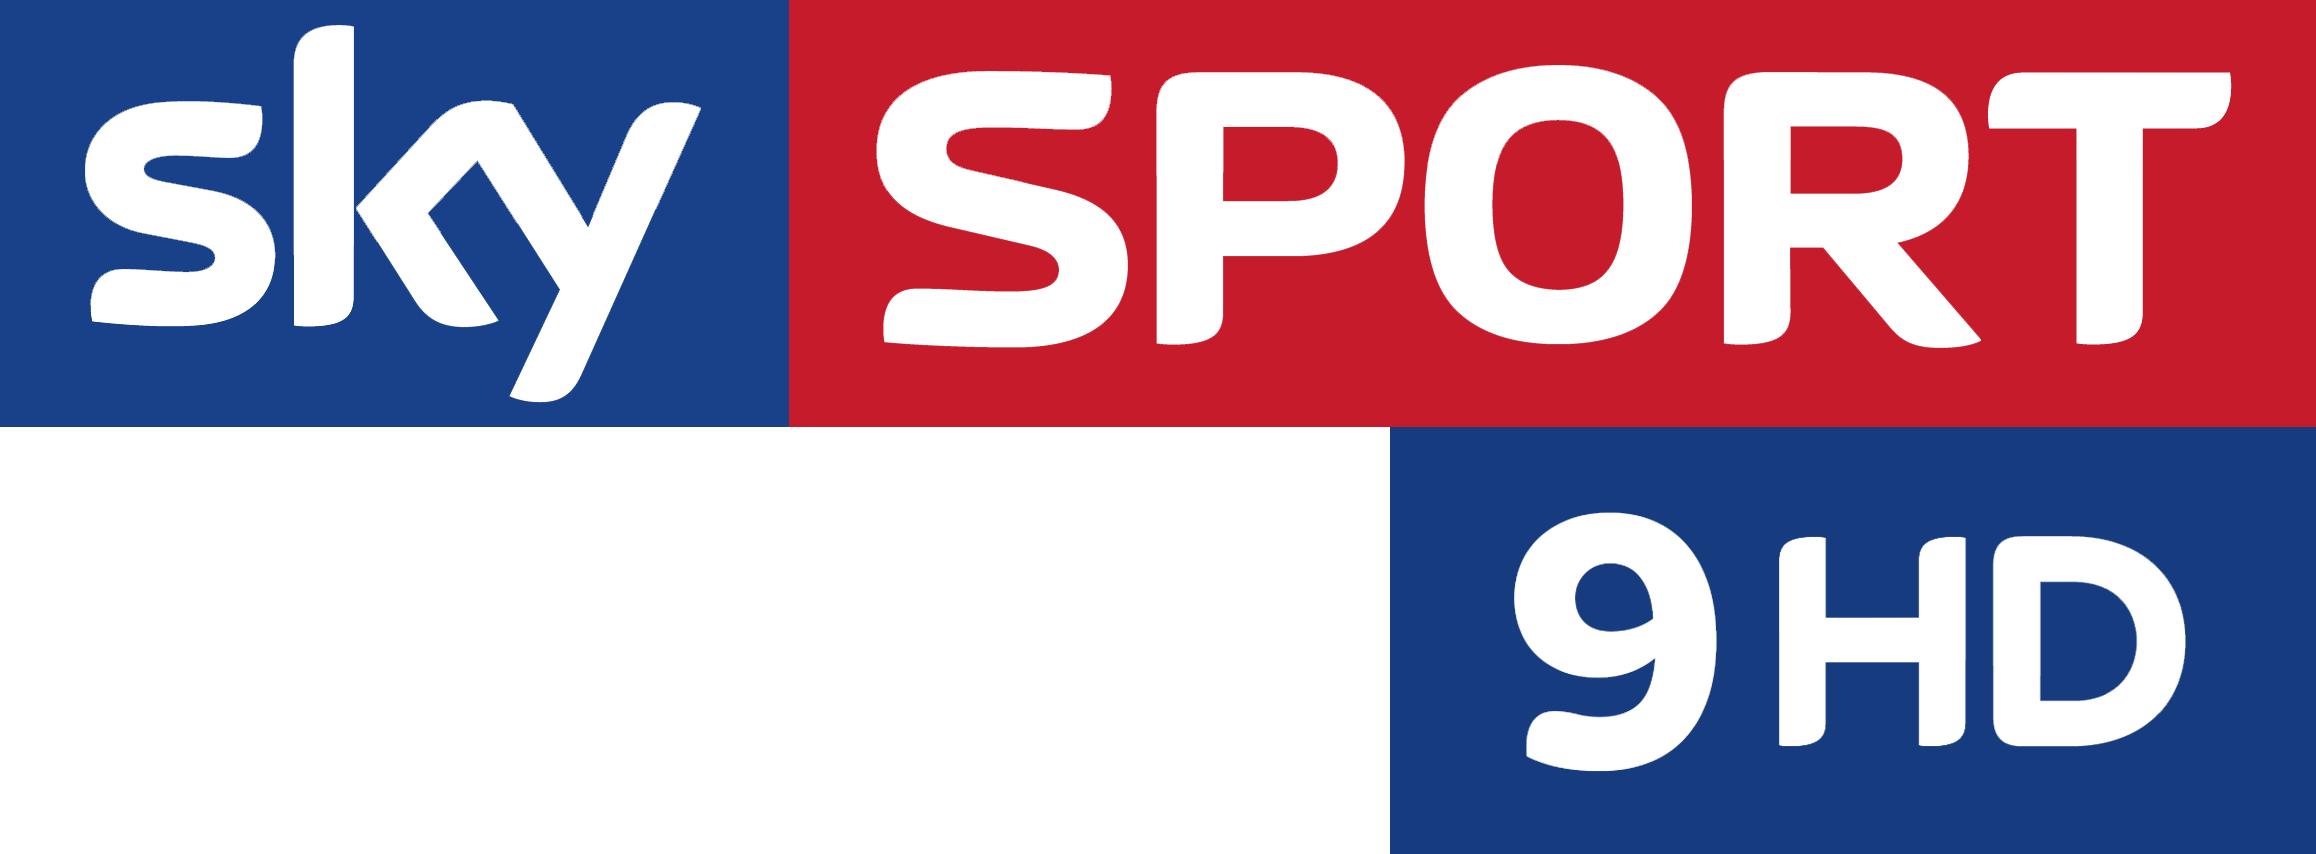 Sky Sport 9